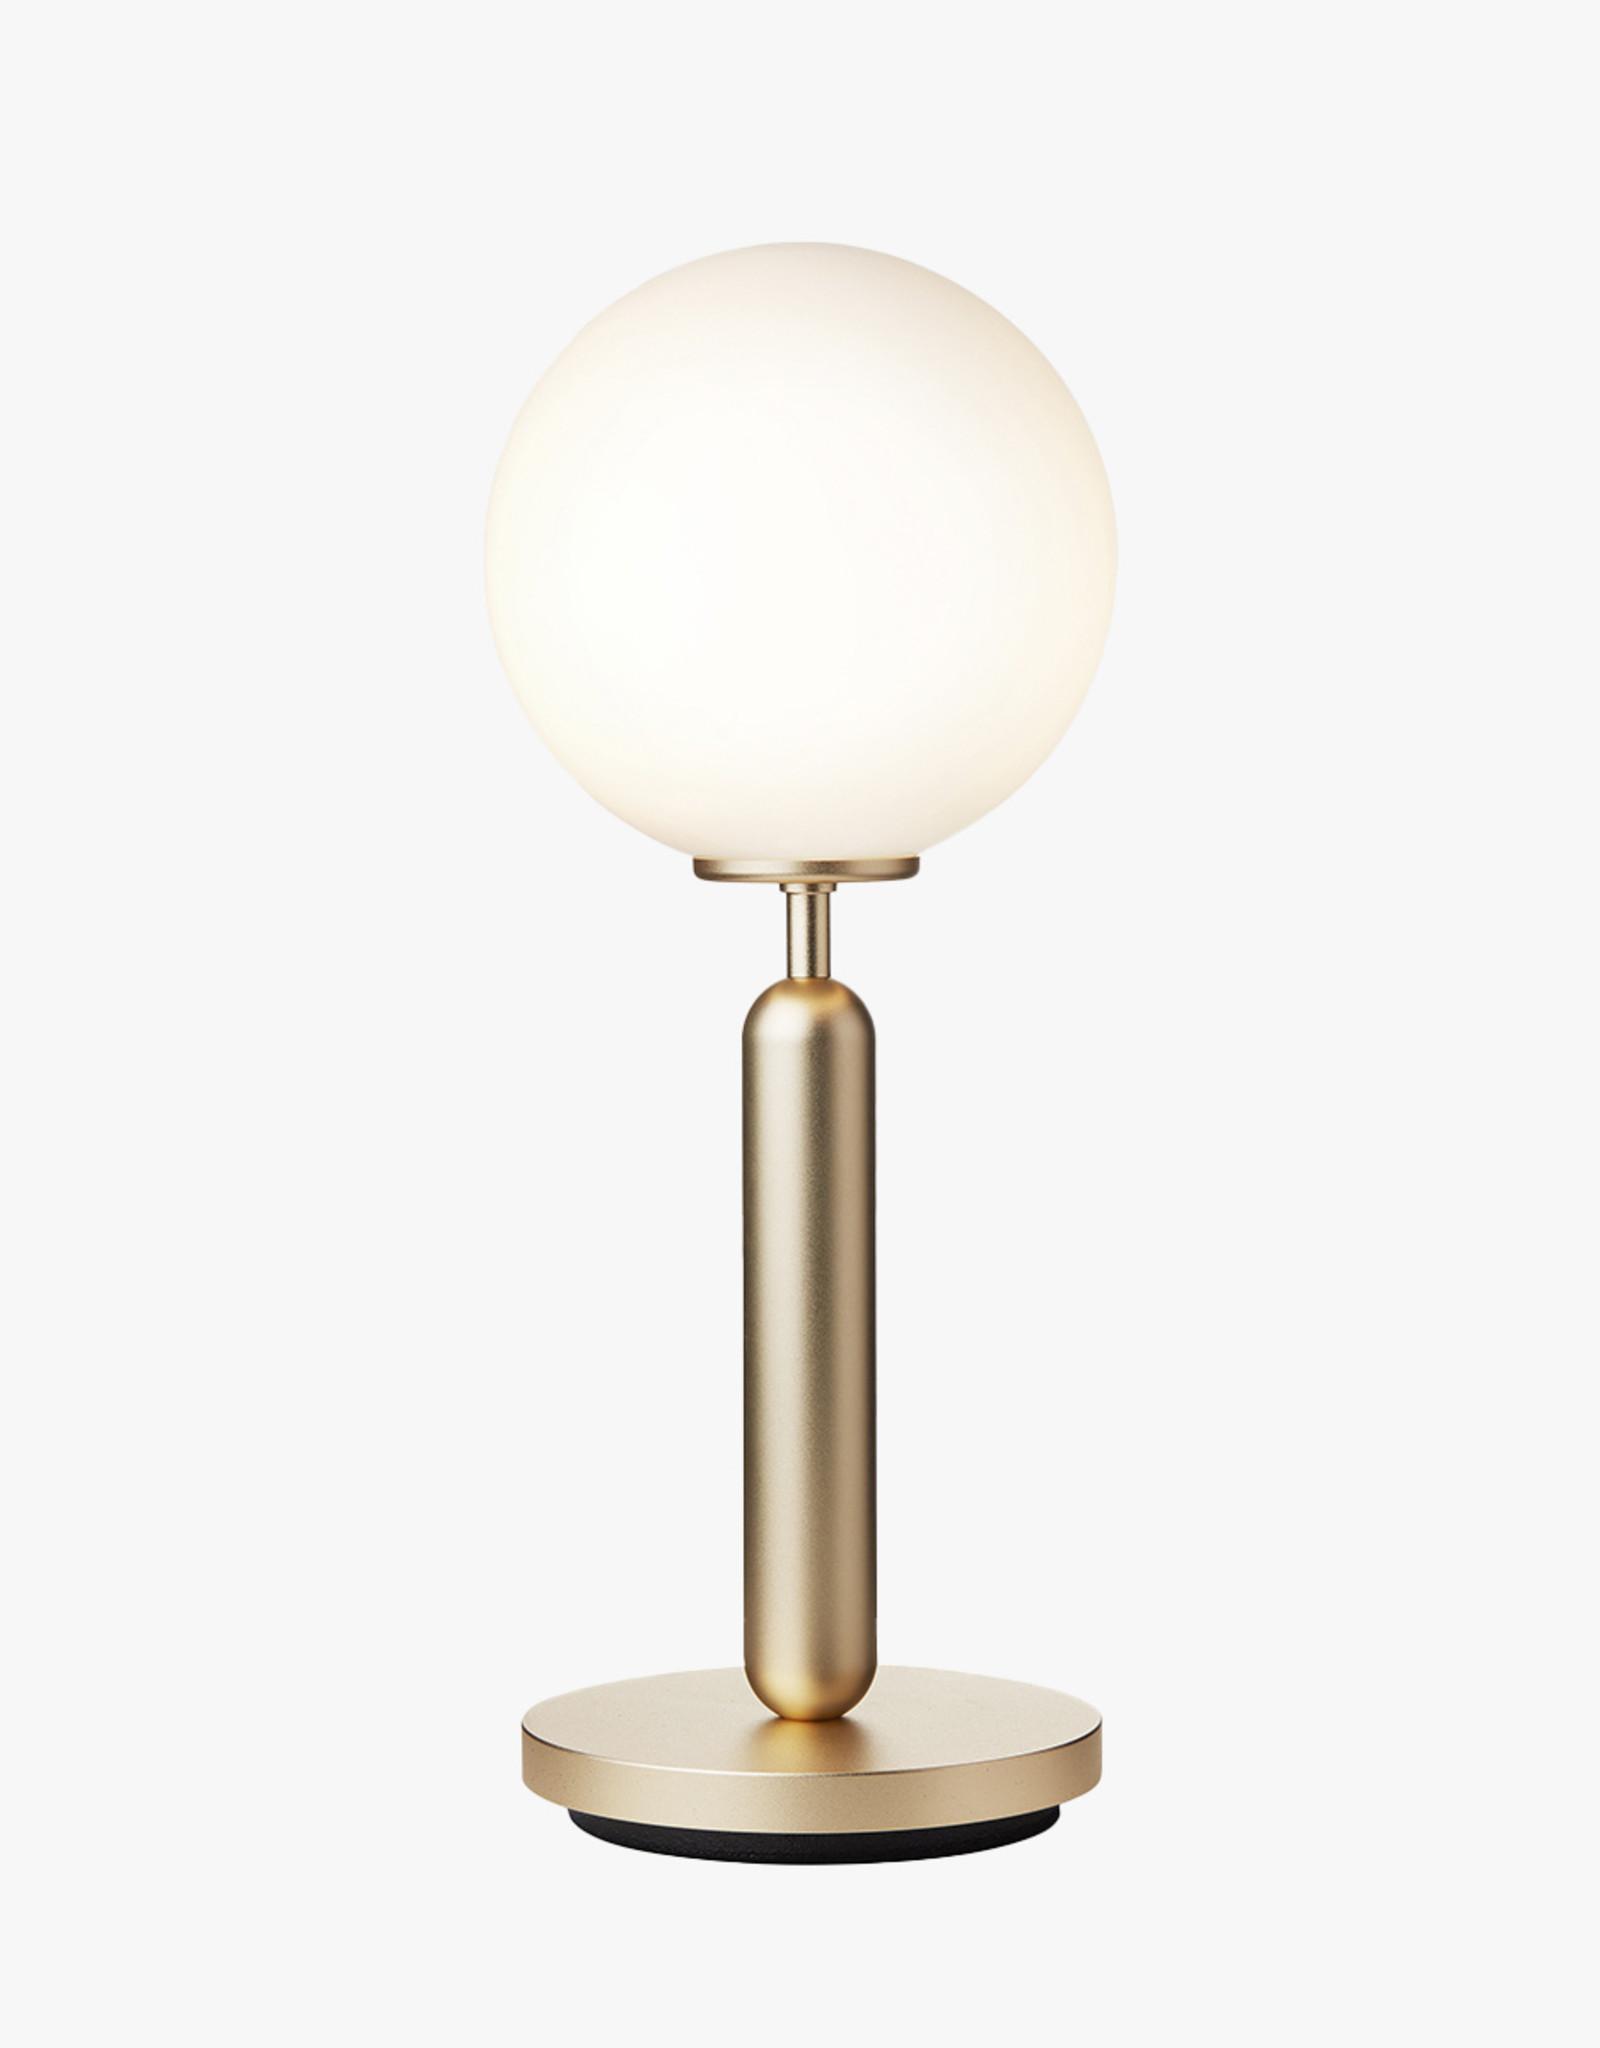 Nuura Miira table light by Sofie Refer | Brass/opal white